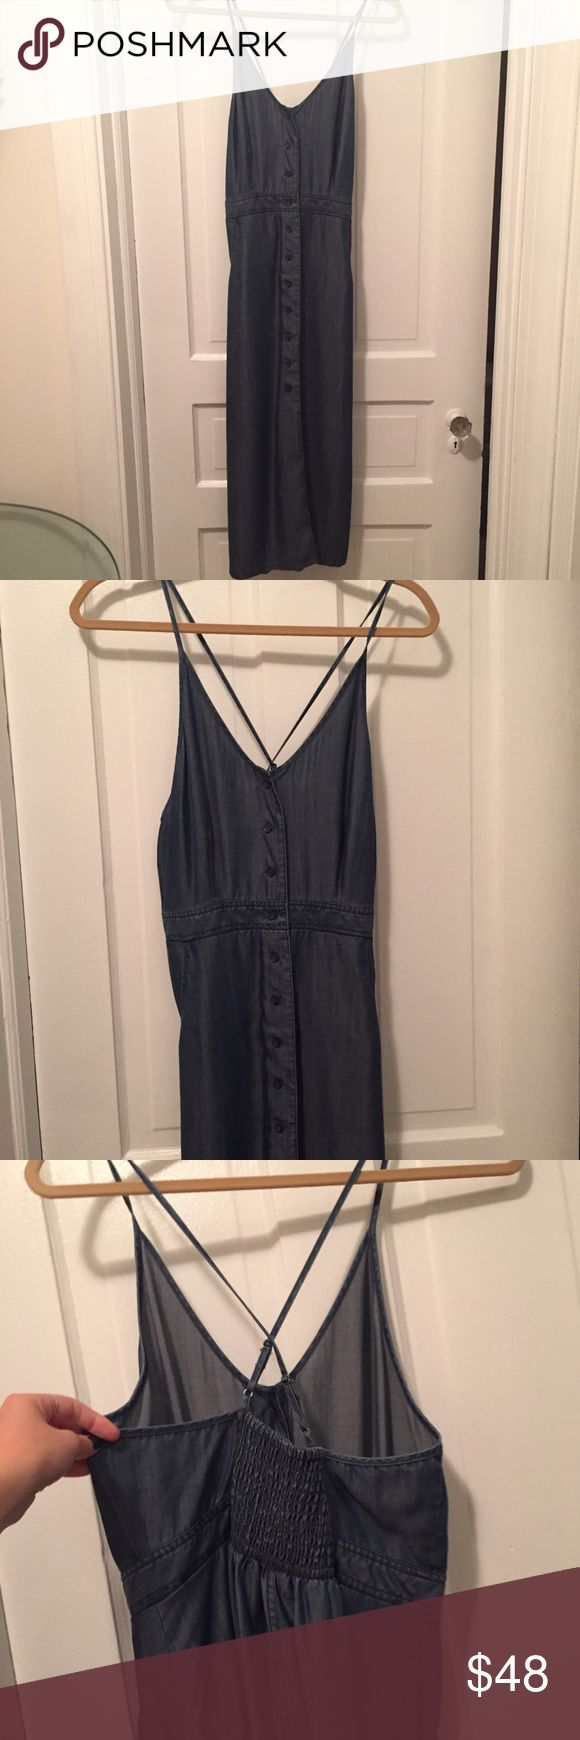 Denim midi dress MIDI denim dress. Button down the from. Adjustable spaghetti straps. Cinching in the back for waist definition. Anthropologie Dresses Midi